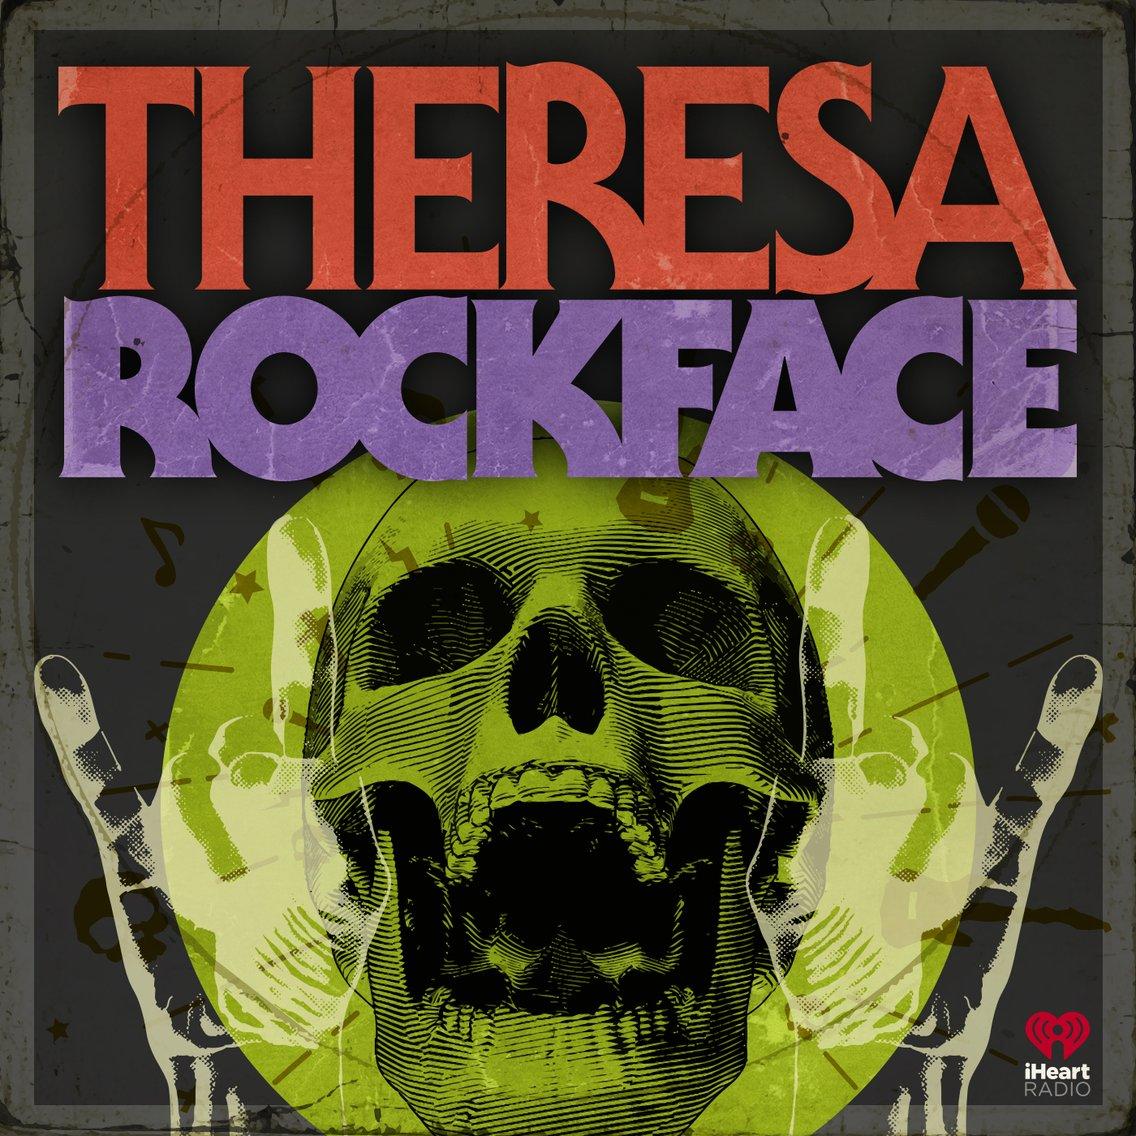 TheresaRockface - Cover Image